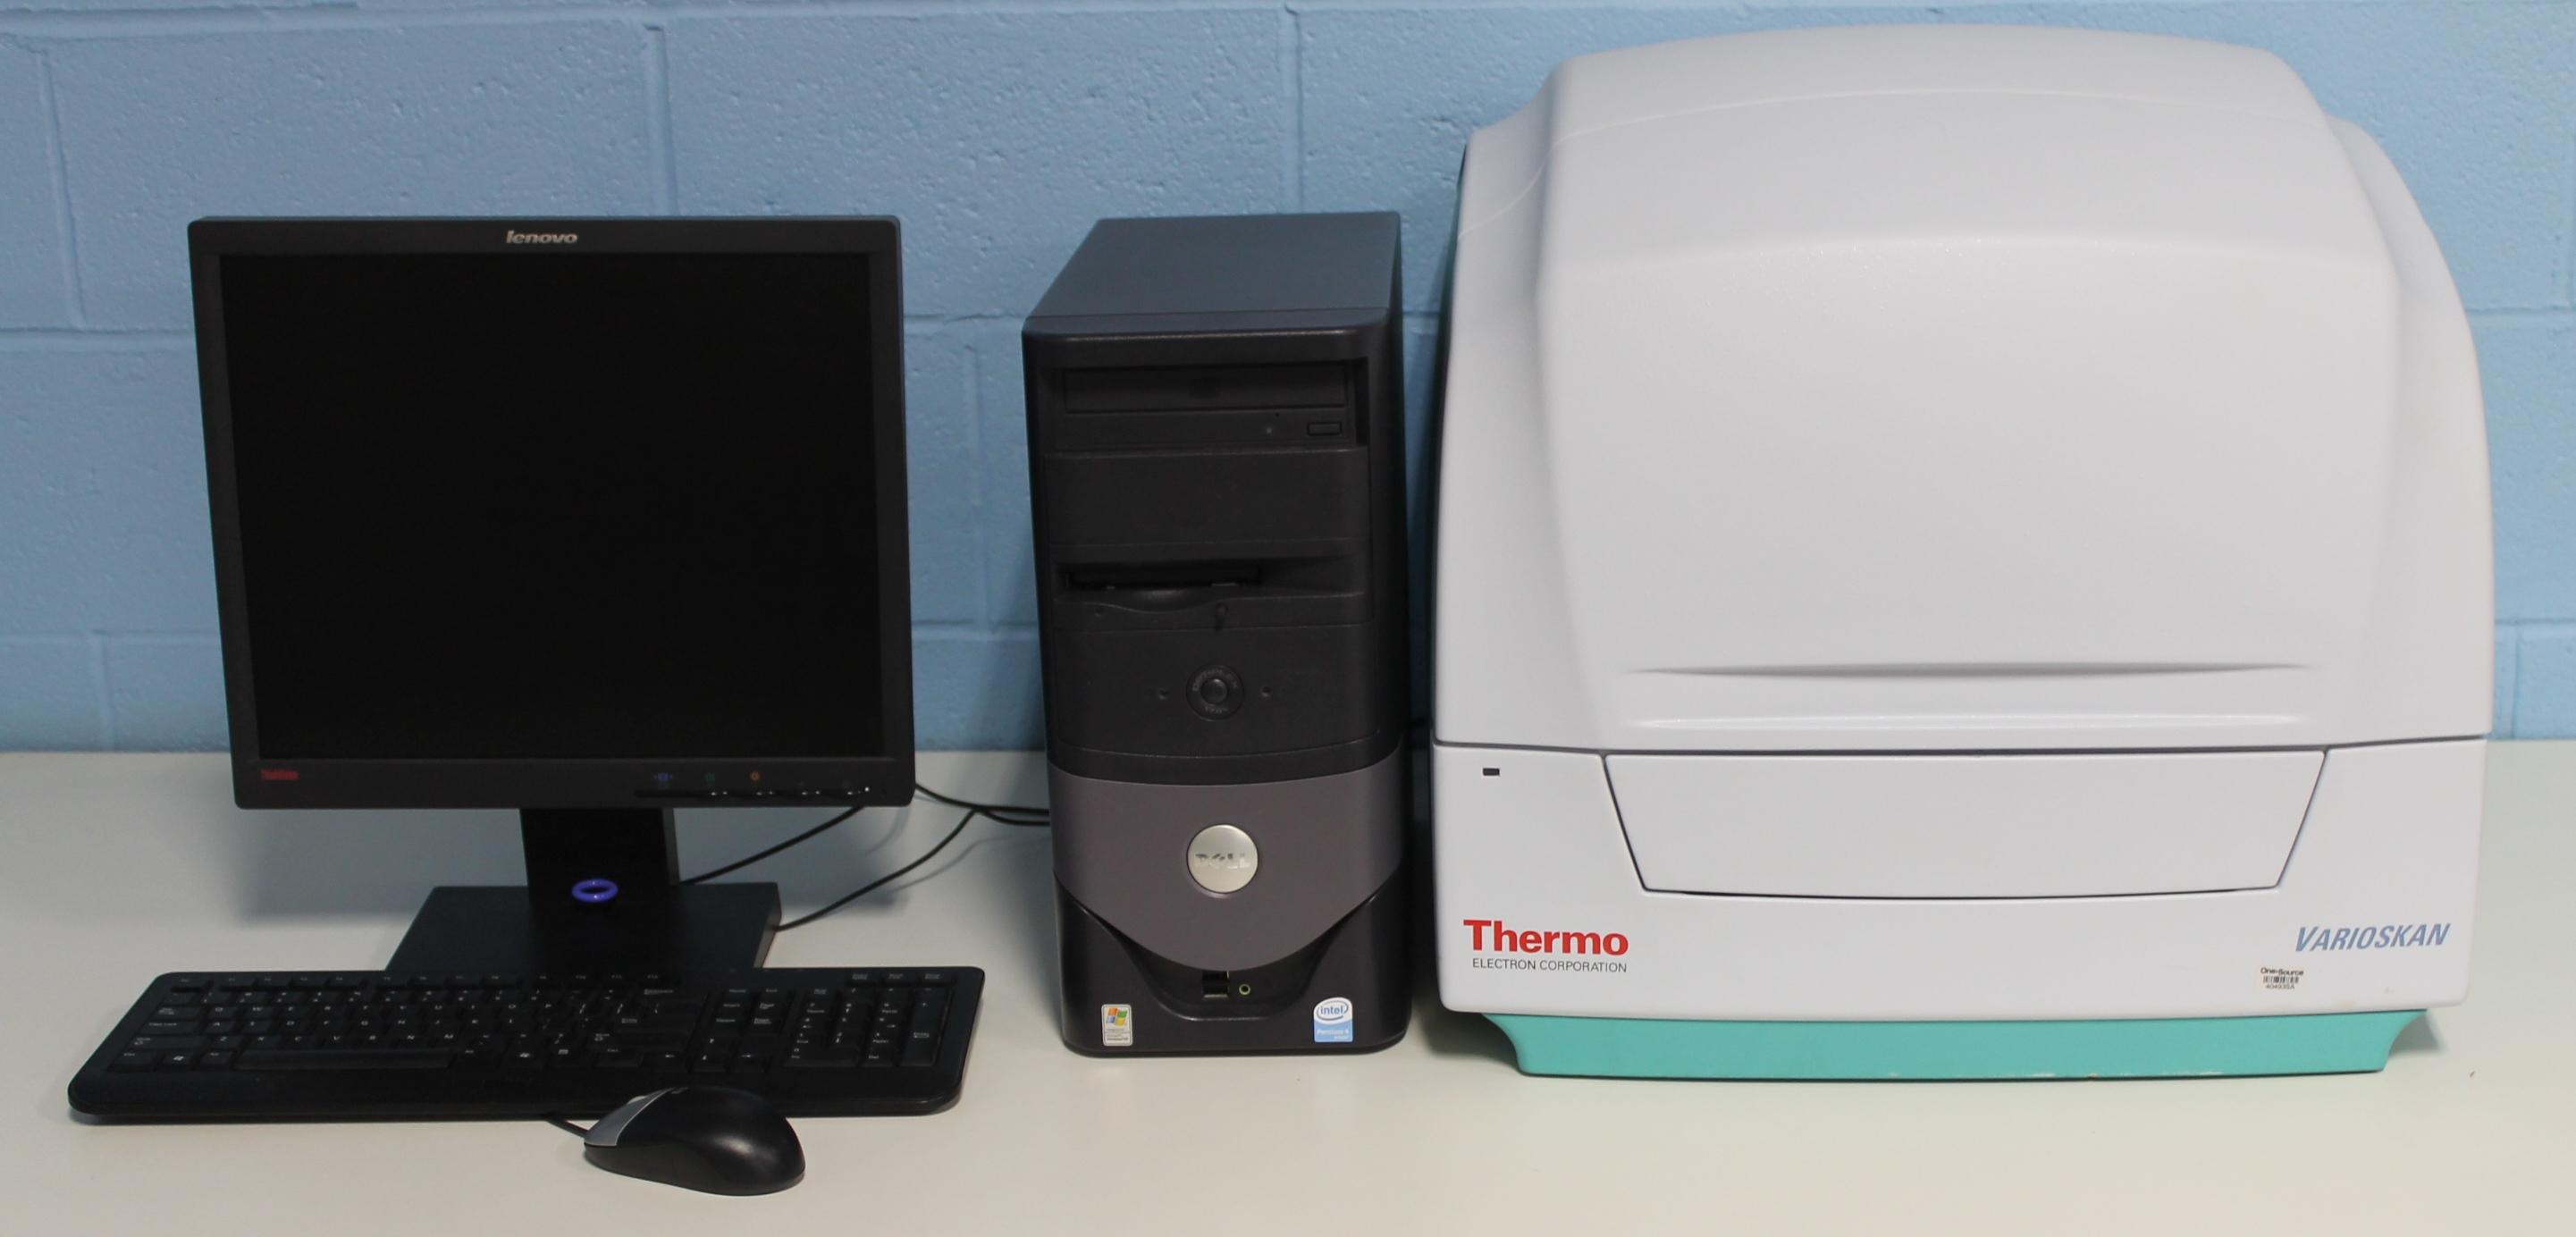 Thermo Electron Corporation Varioskan Multimode Reader Image